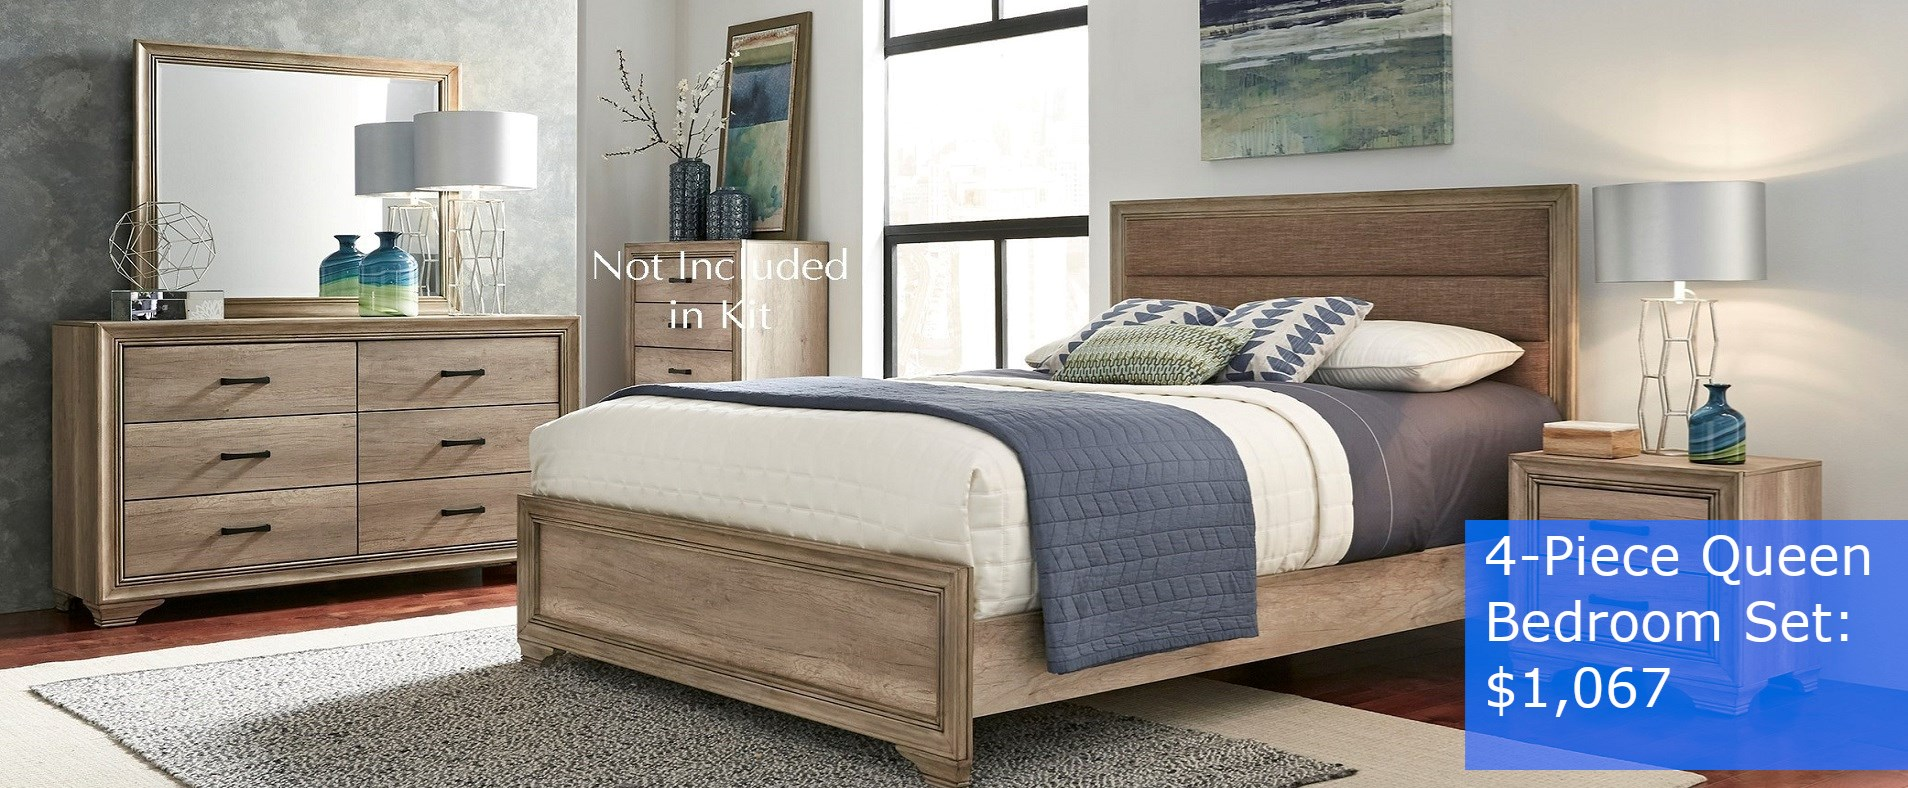 Bedroom Set SV